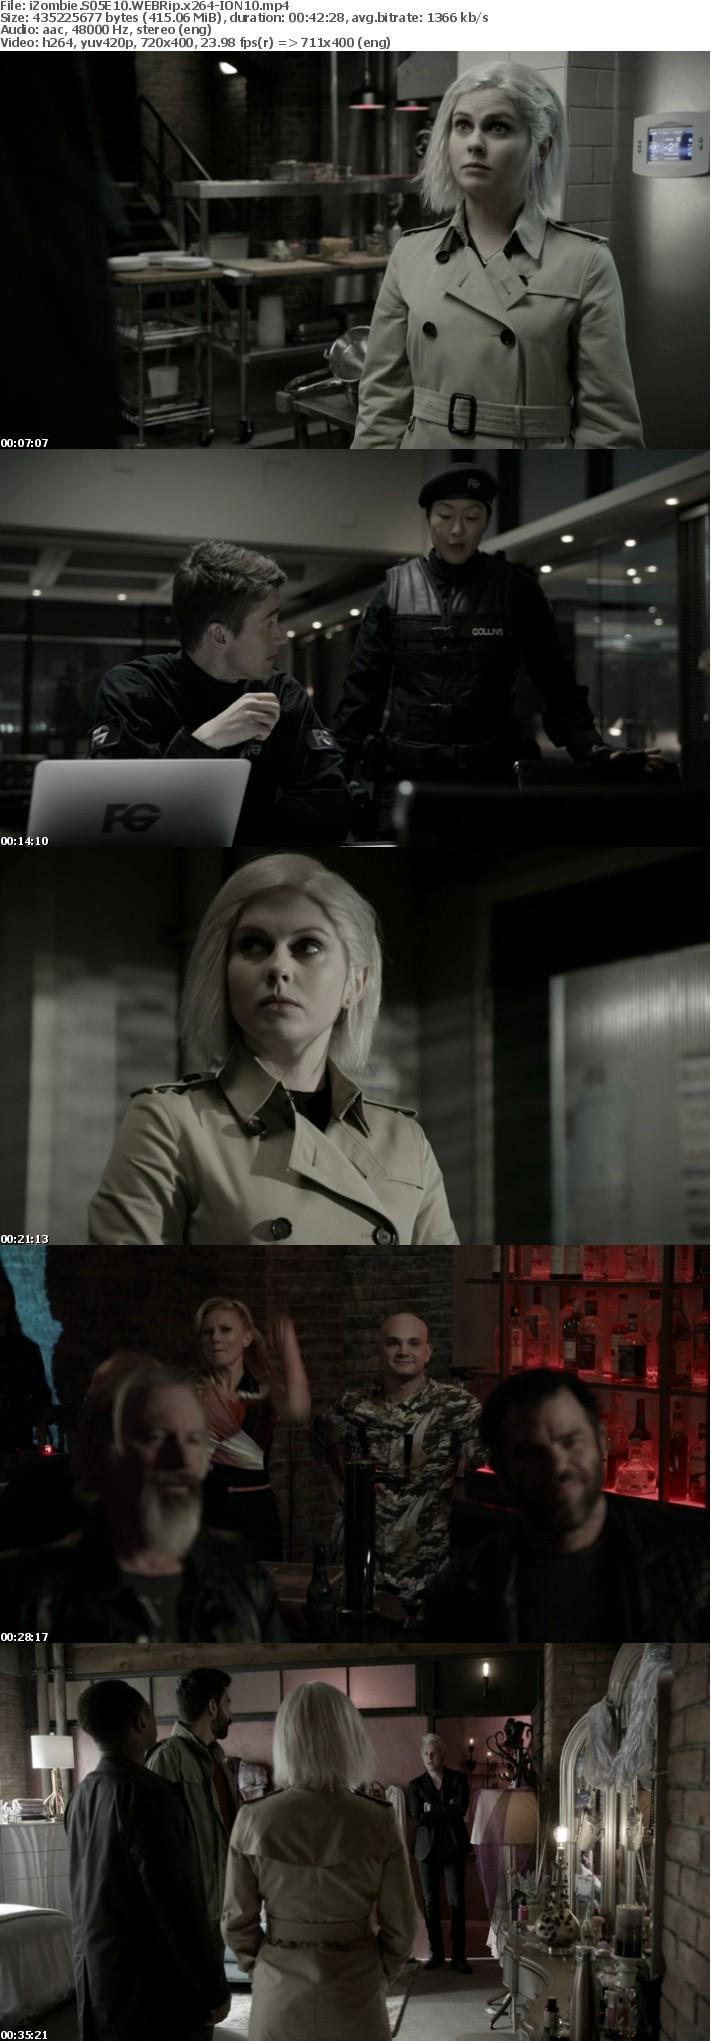 iZombie S05E10 WEBRip x264-ION10